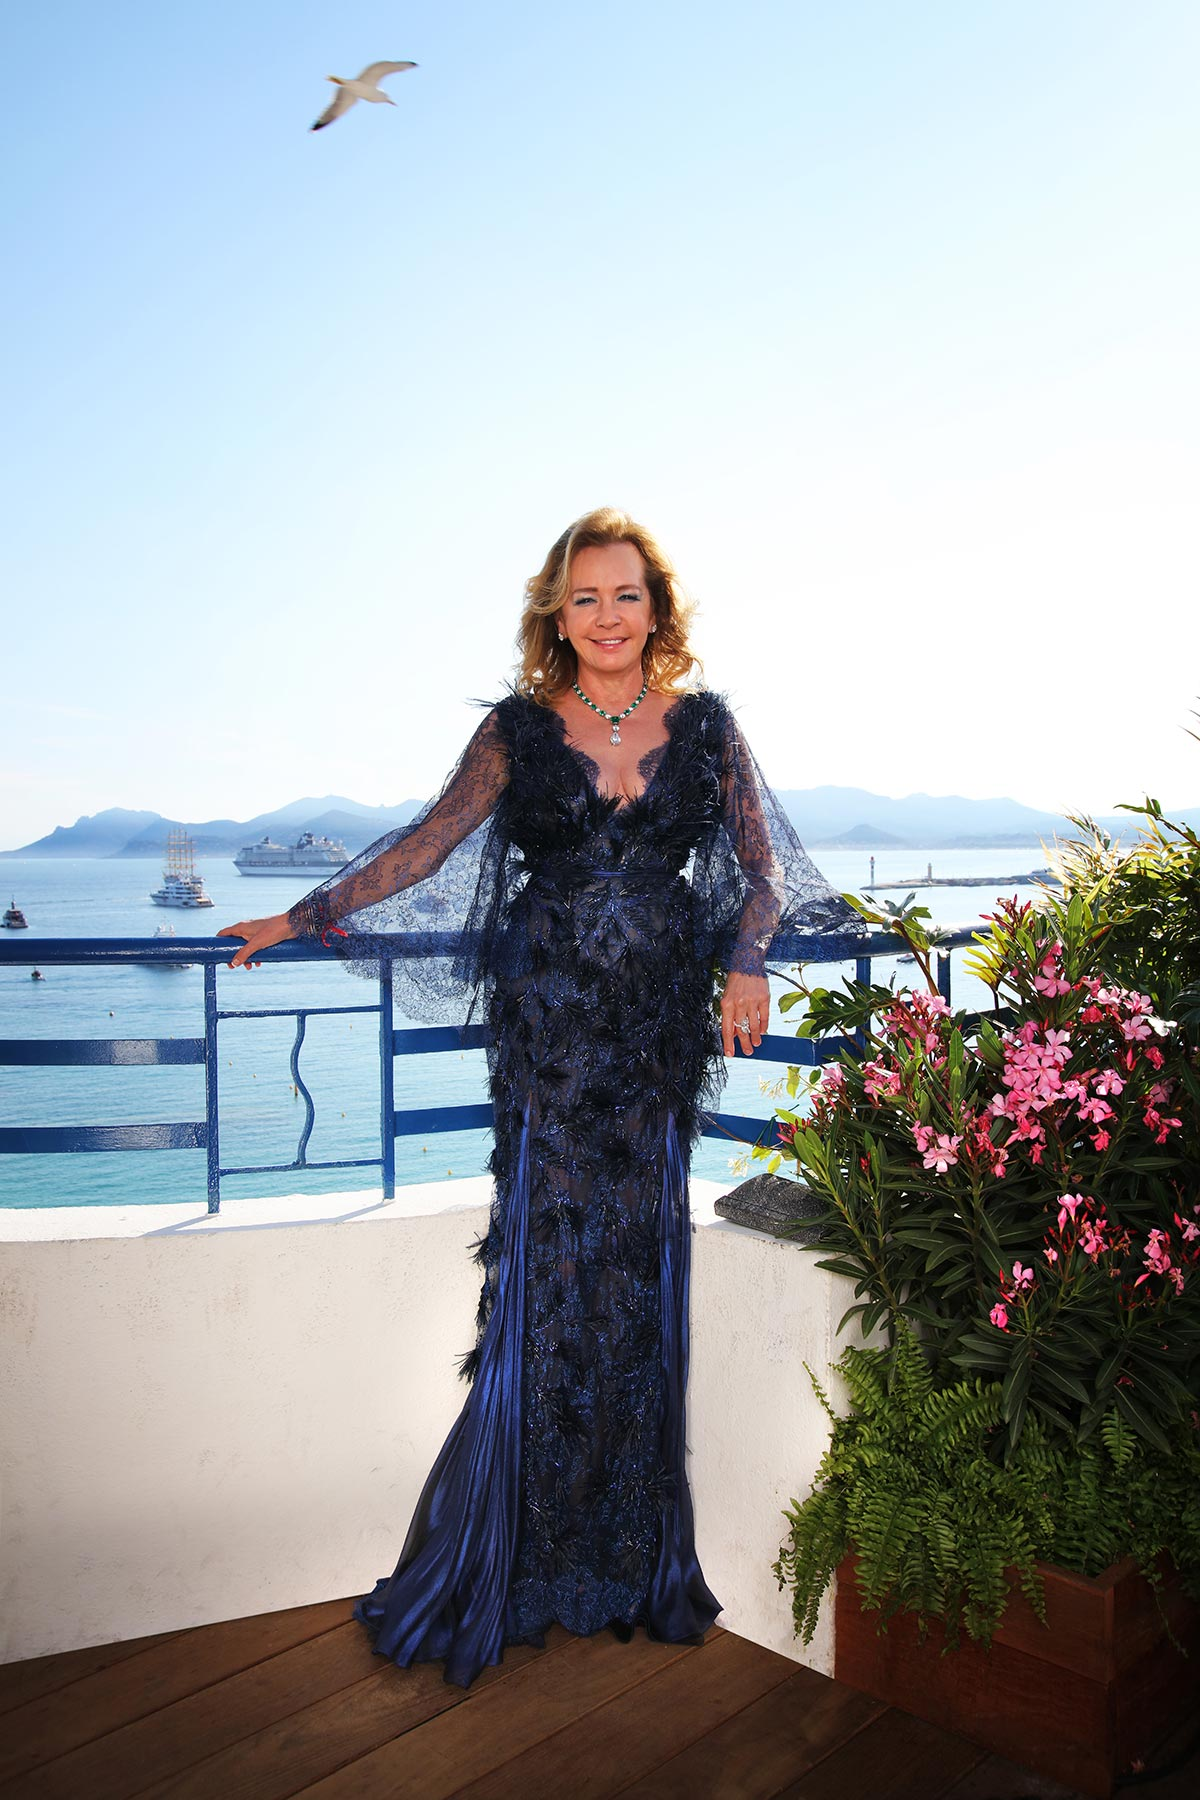 Cannes 2018 - Closing Ceremony - Caroline Scheufele - Hair and makeup Massimo Serini